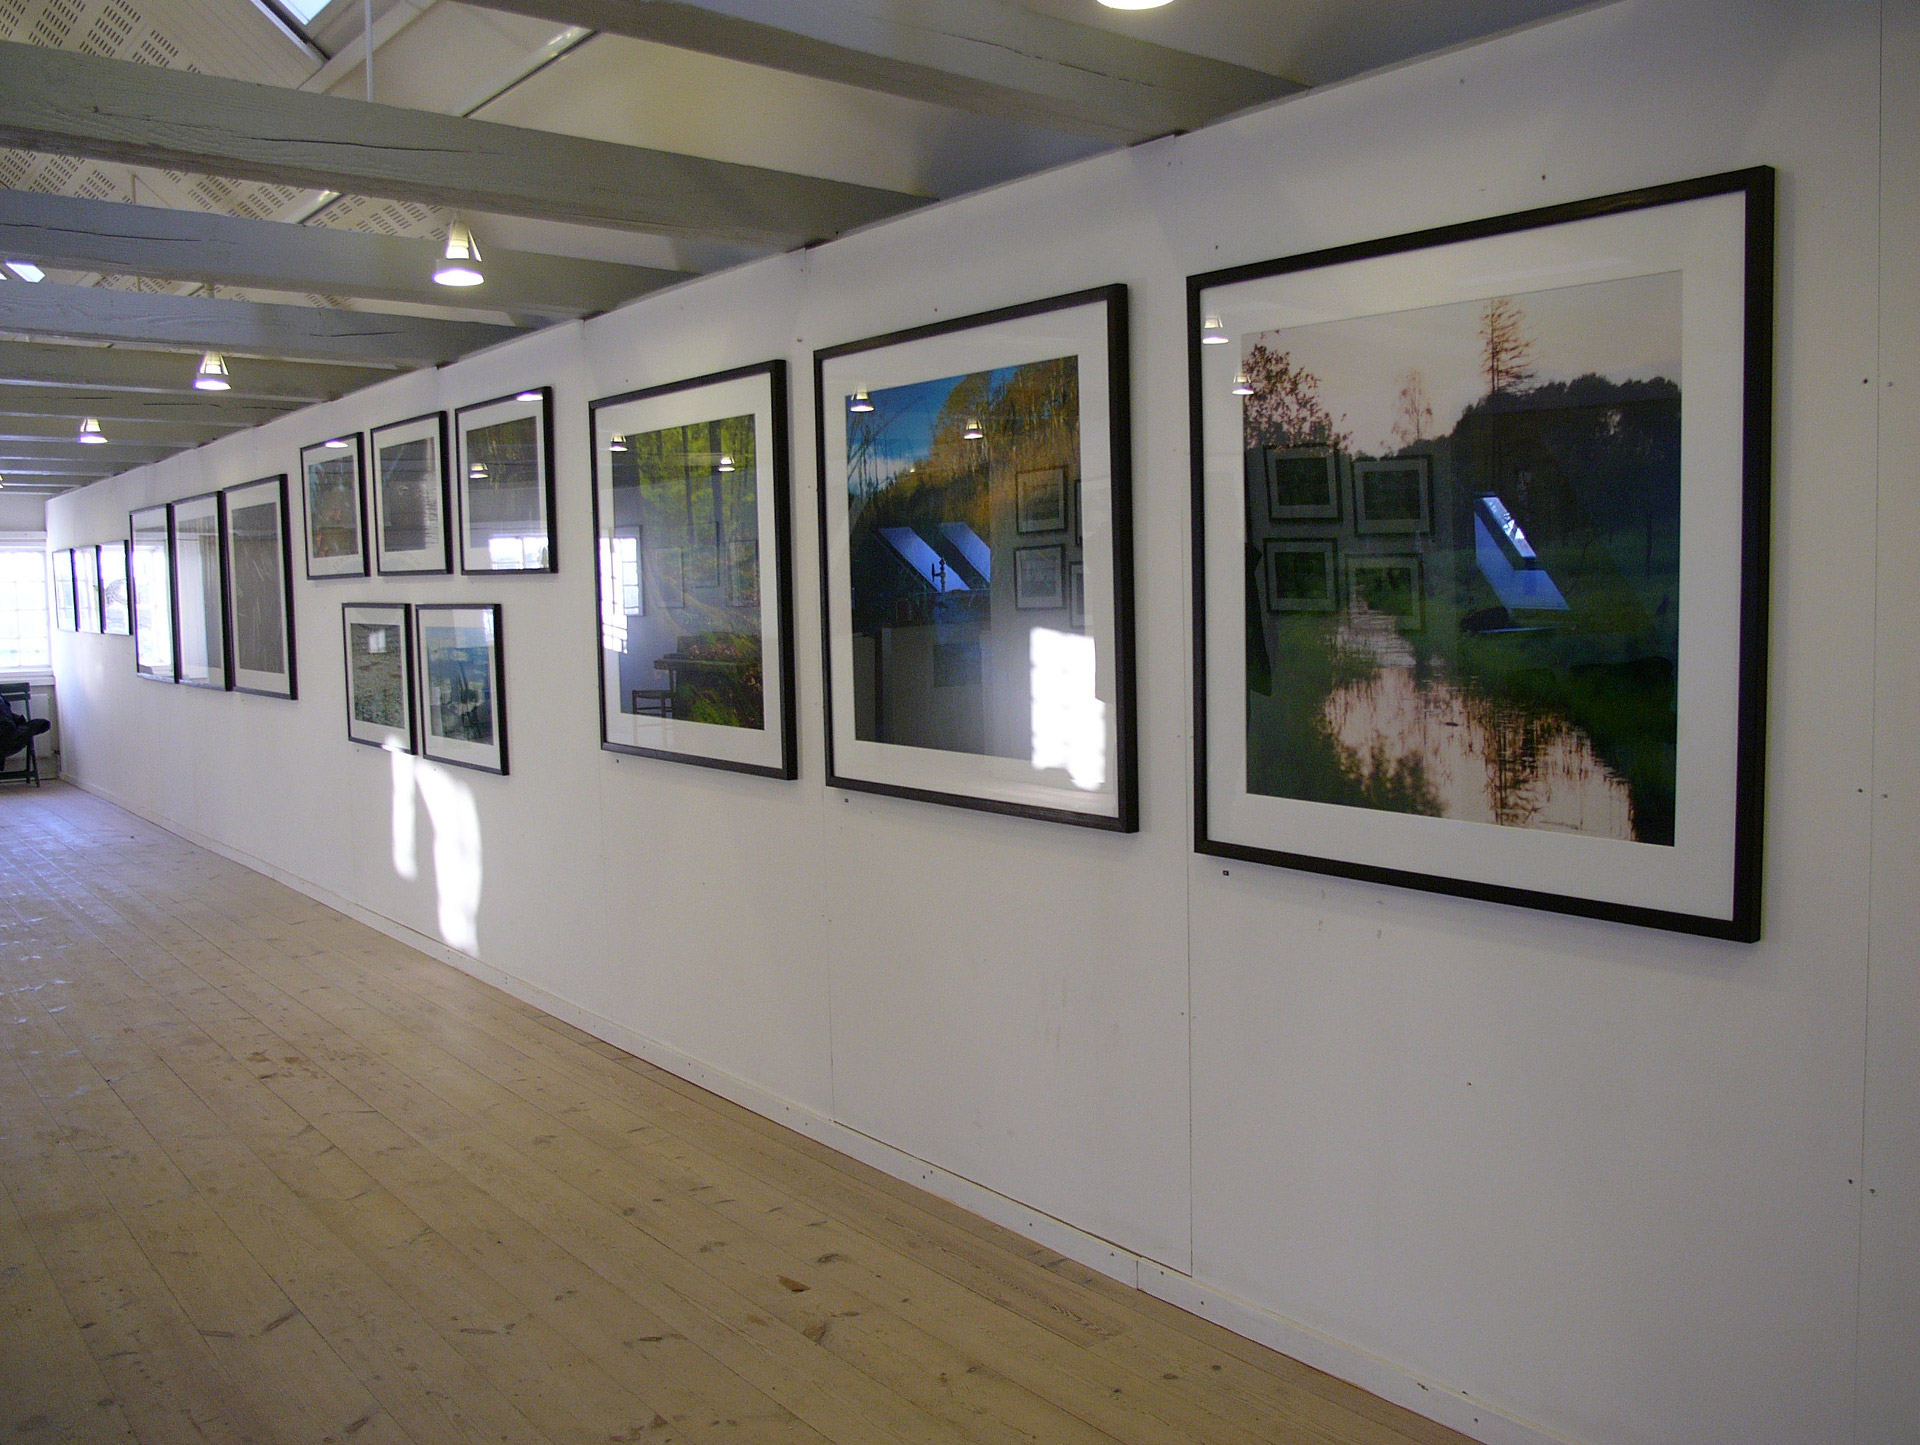 Mikkel Alexander Grabowski's exhibition about Mølleåen in Sophienholm in Lyngby